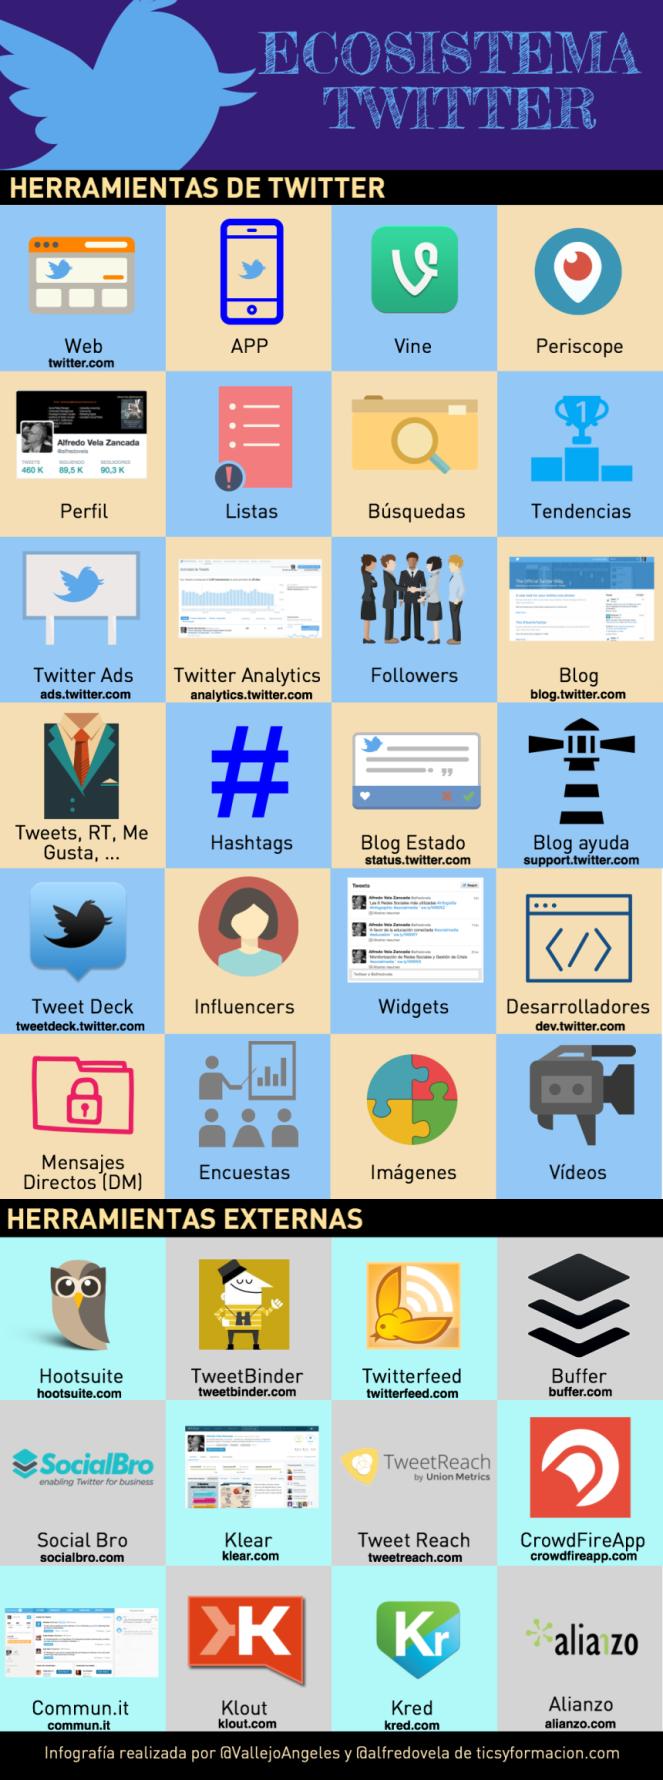 ecosistema-twitter-infografia1